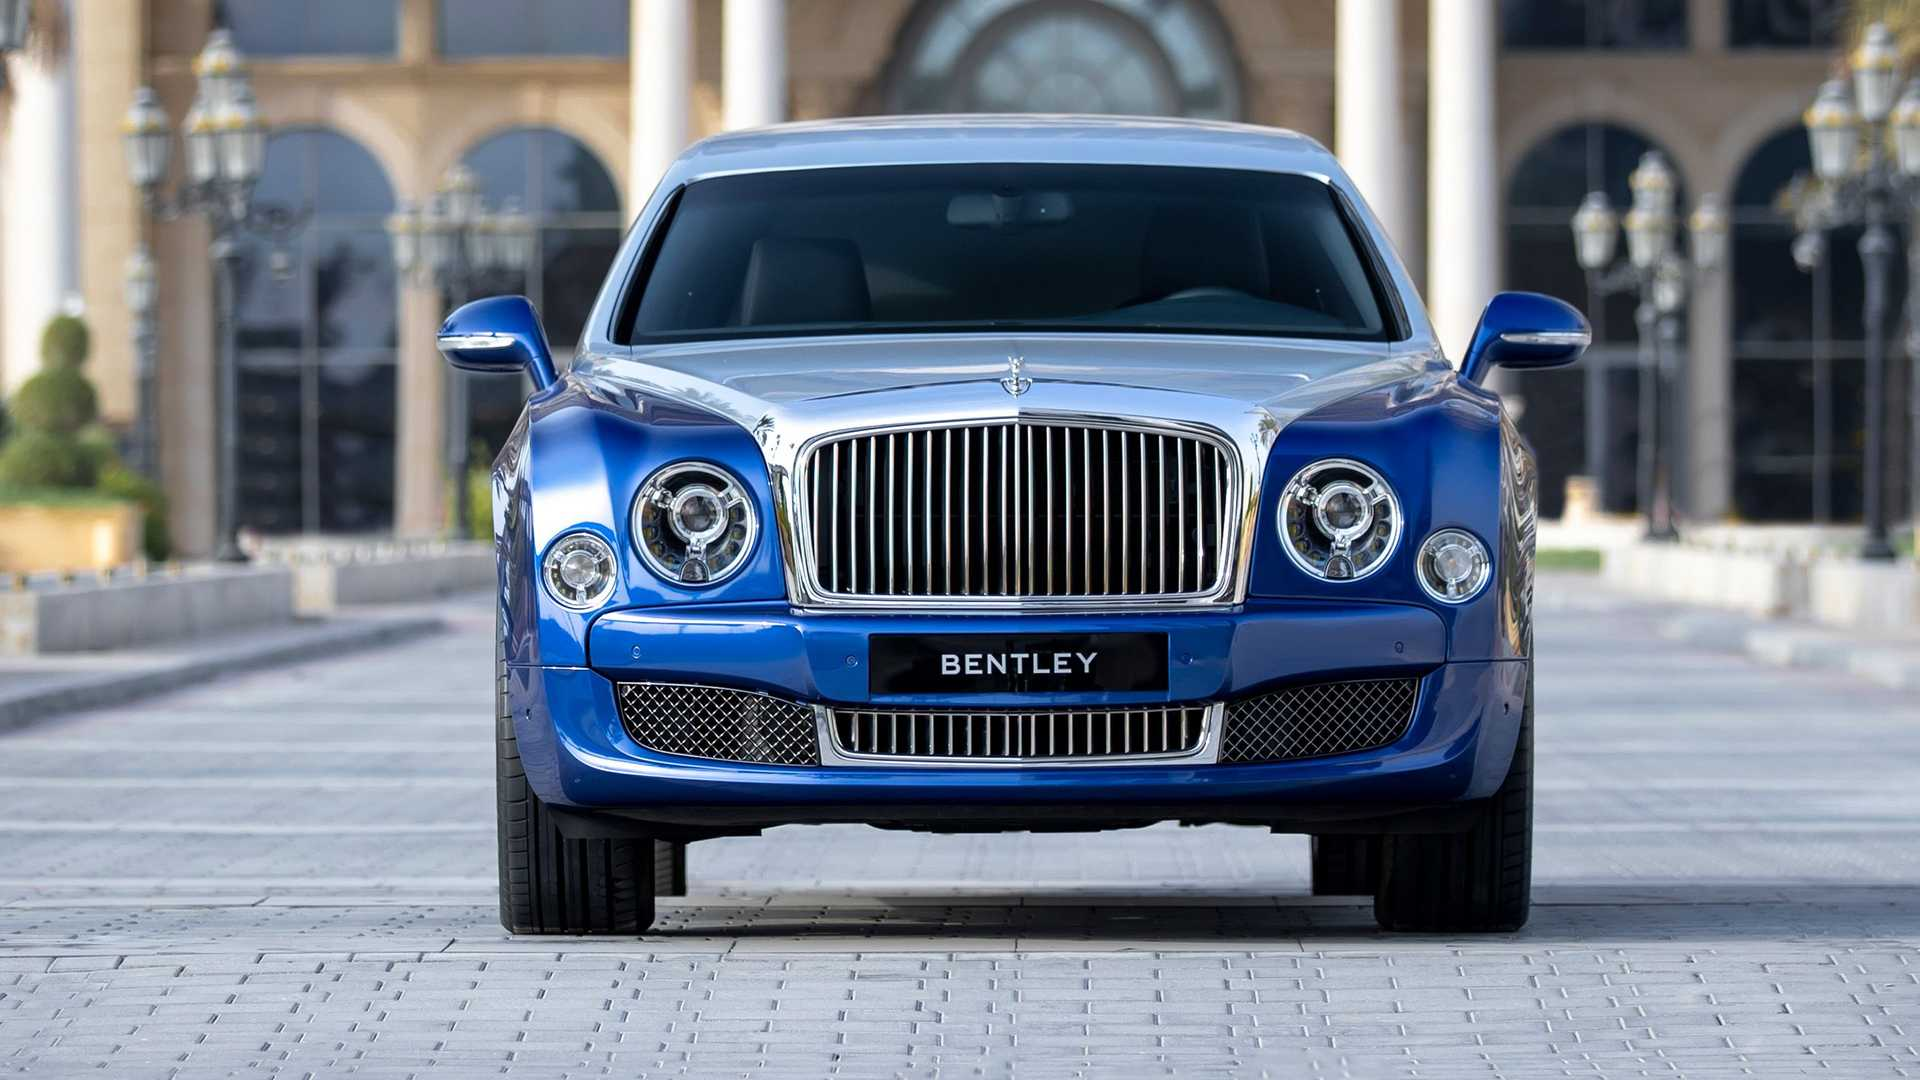 Bentley-Mulsanne-Grand-Limousine-by-Mulliner-4